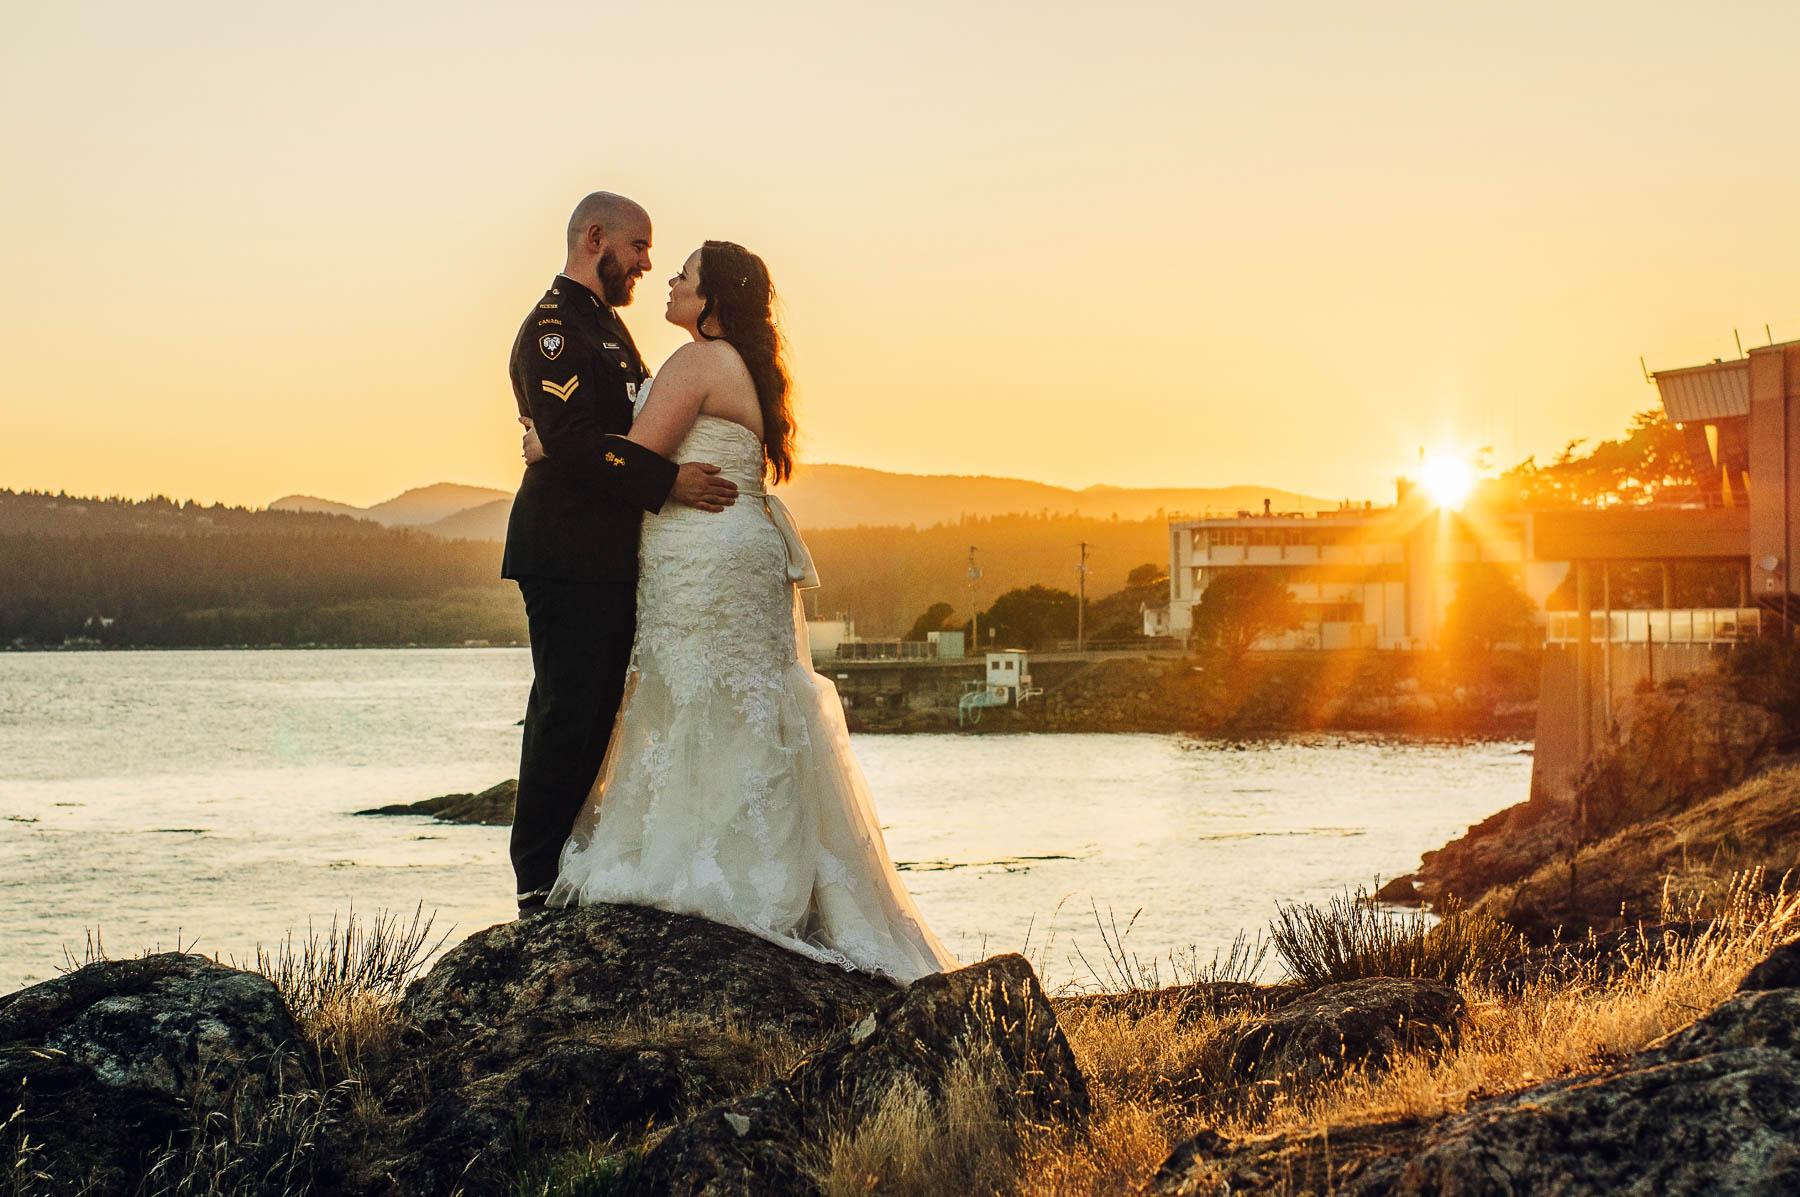 wedding sunset portrait